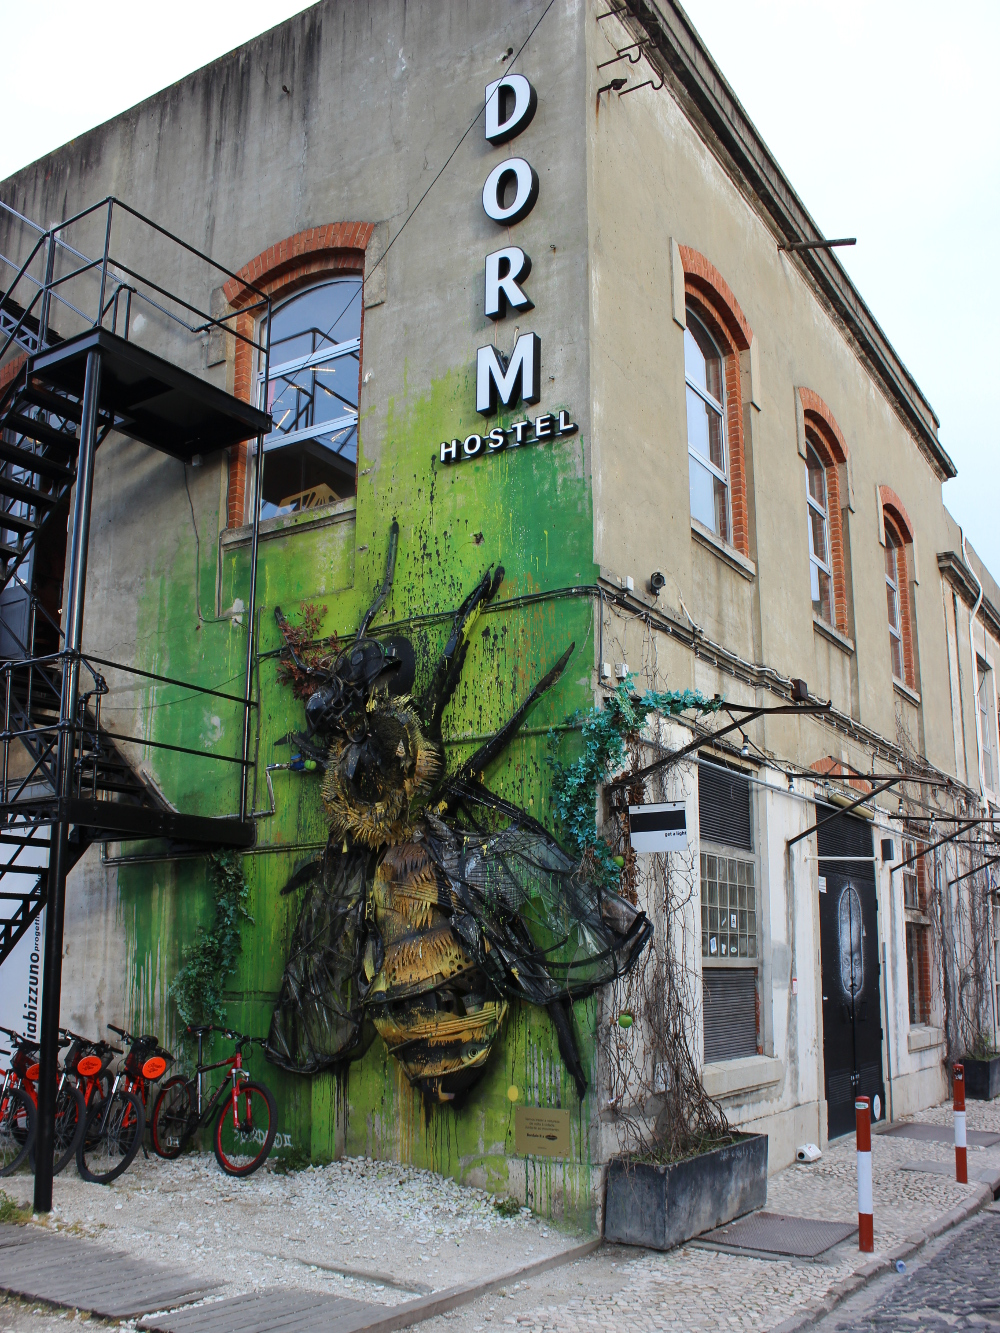 Lissabon Lisbon Lisboa Travel Diary Reise Bericht Tipps LX Factory Street Art